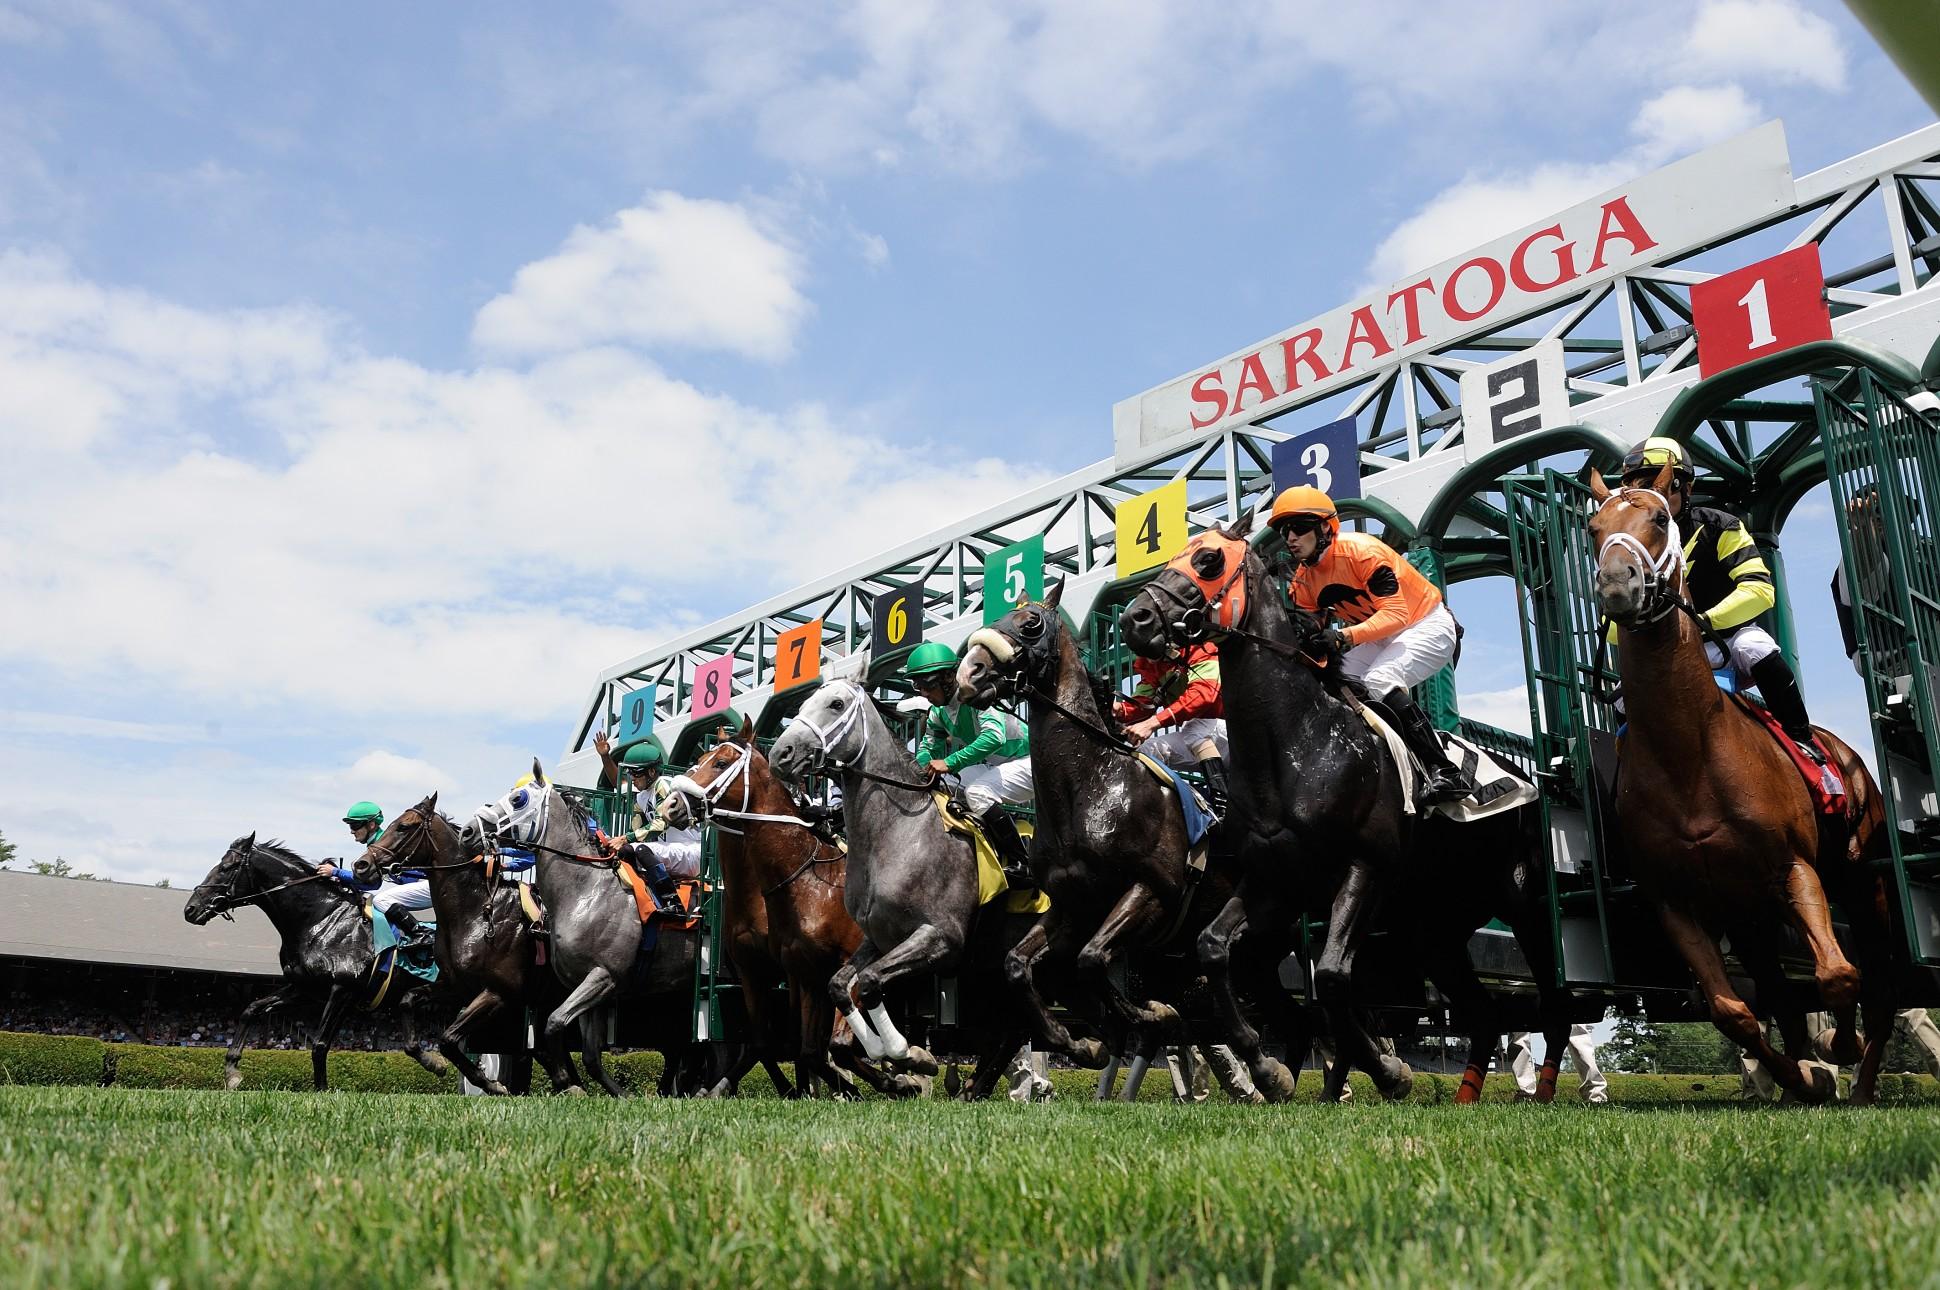 Saratoga-racing